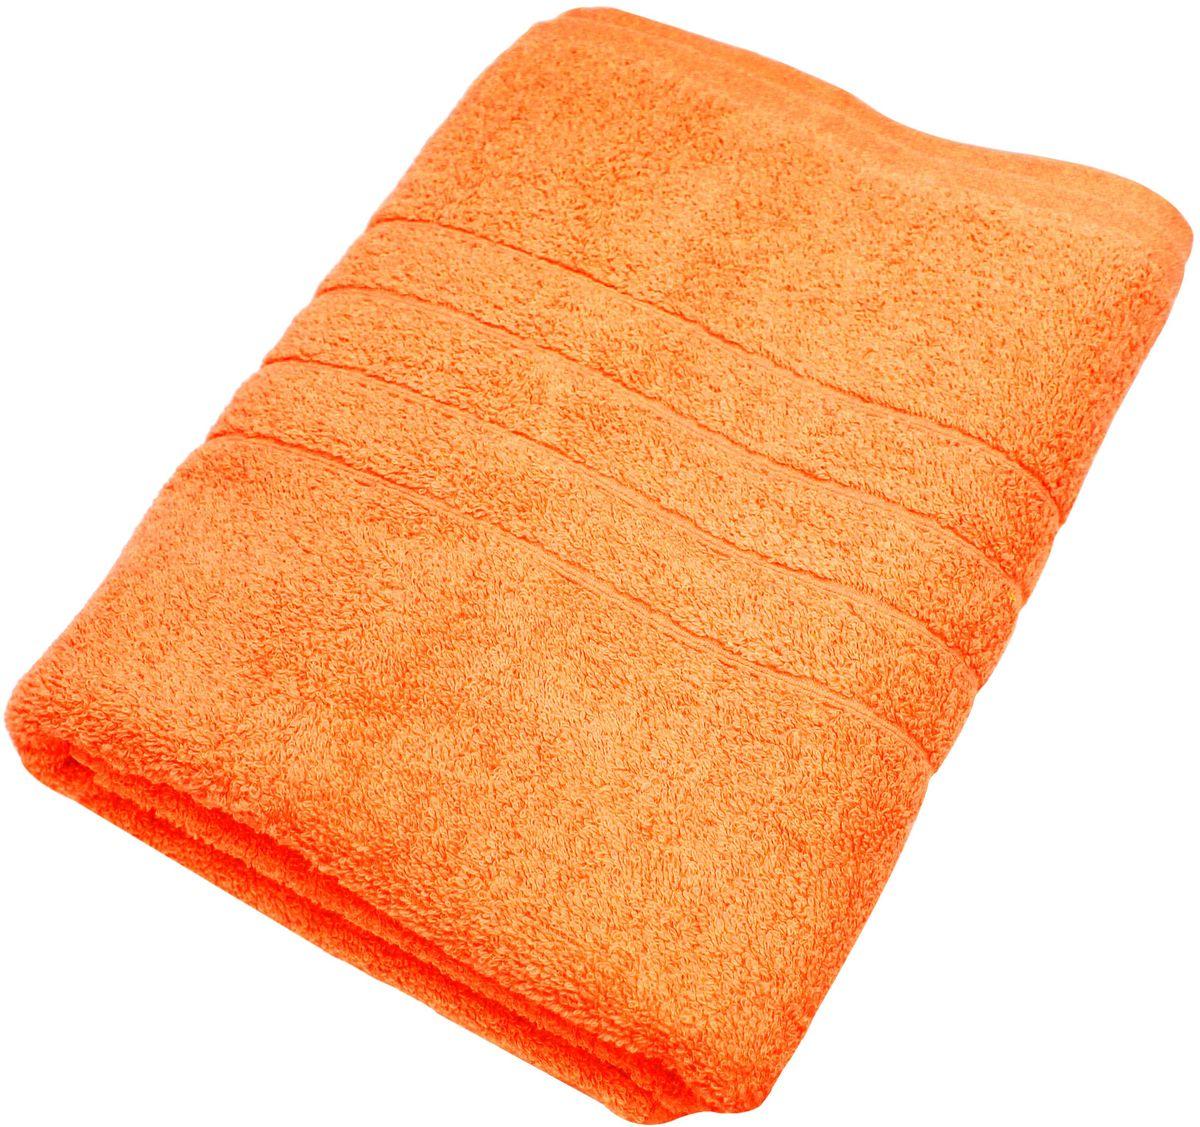 Полотенце Proffi Home Модерн, цвет: оранжевый, 70x140 смPH3277Состав: 100% хлопок.